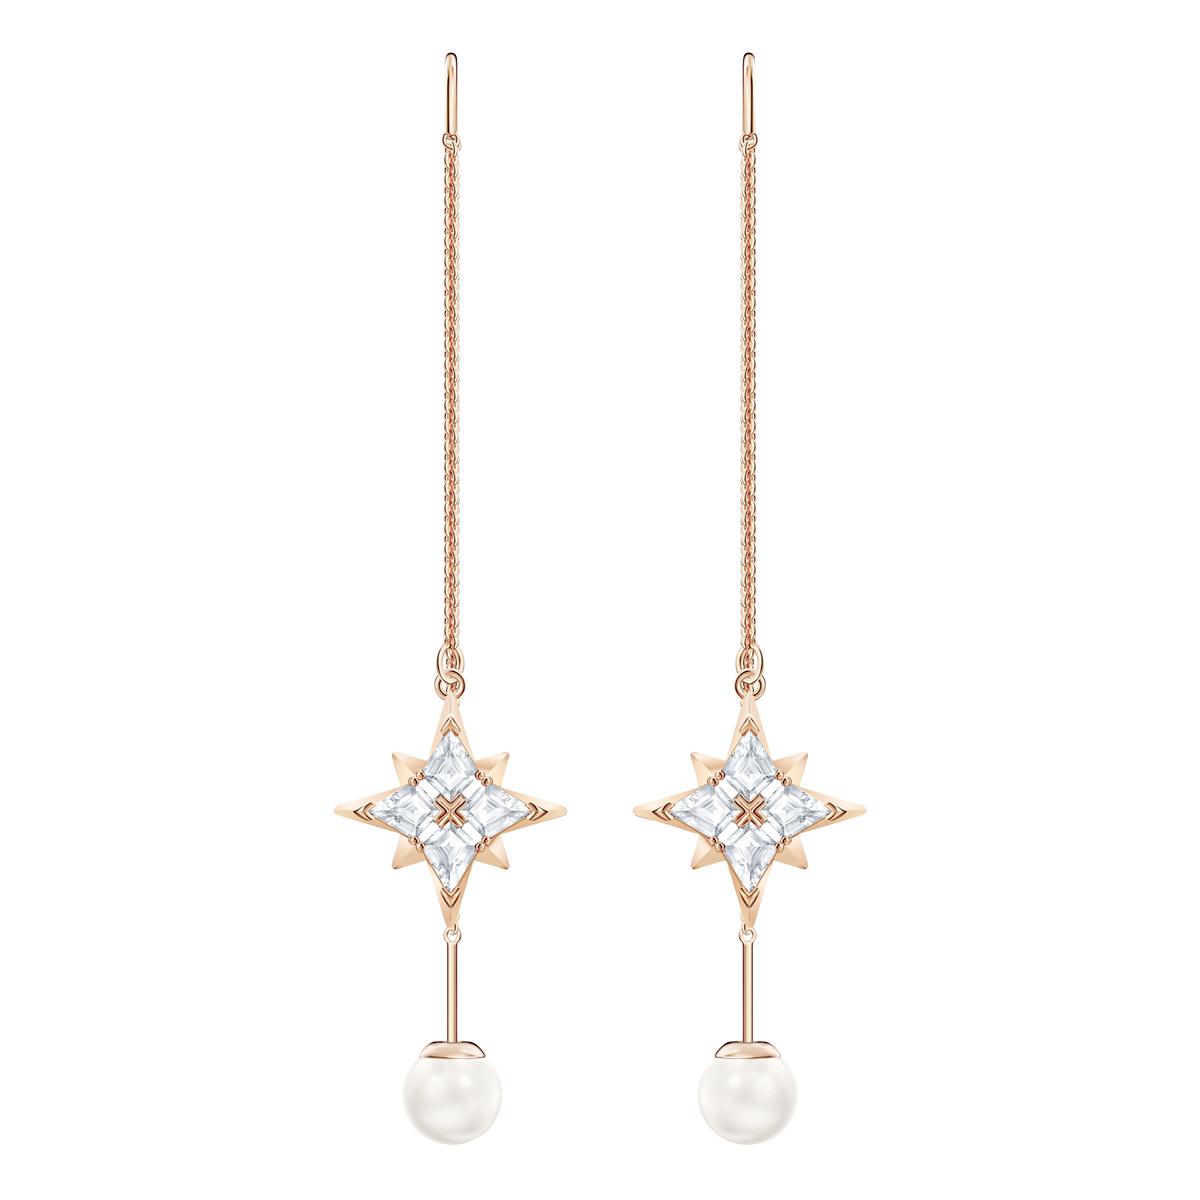 Swarovski Symbolic Chain Pierced Earrings, White, Rose Gold